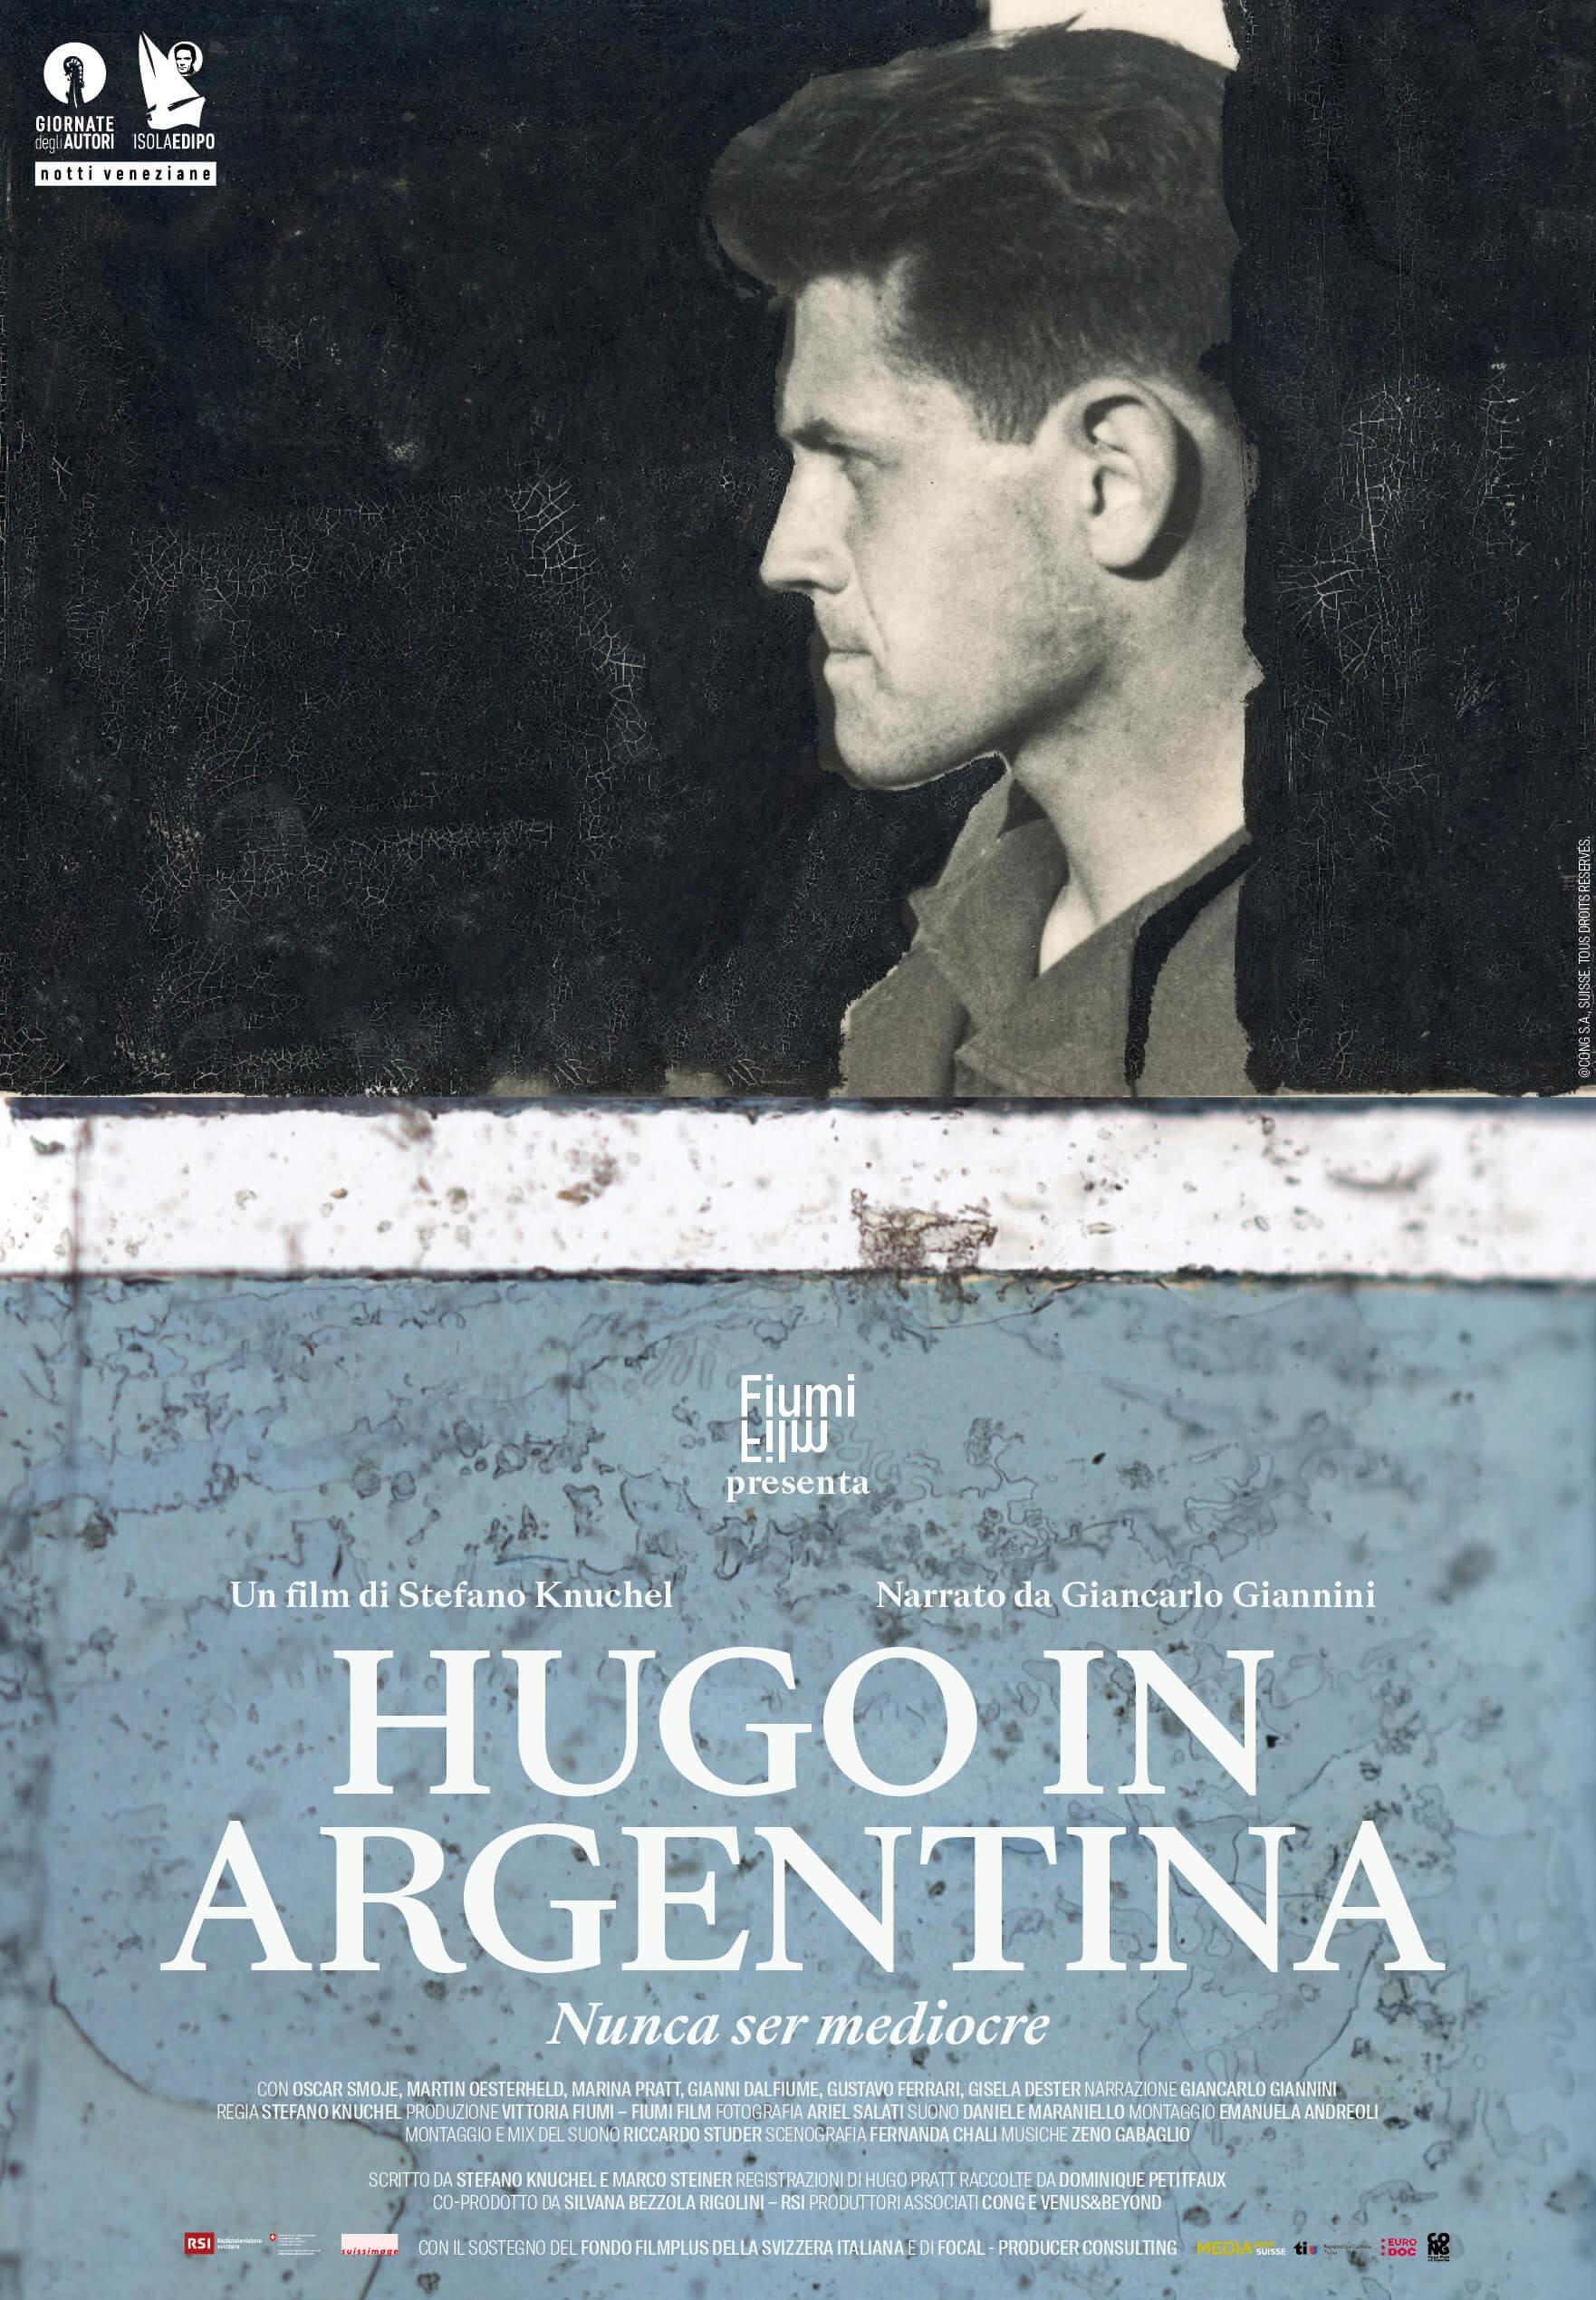 Hugo in Argentina